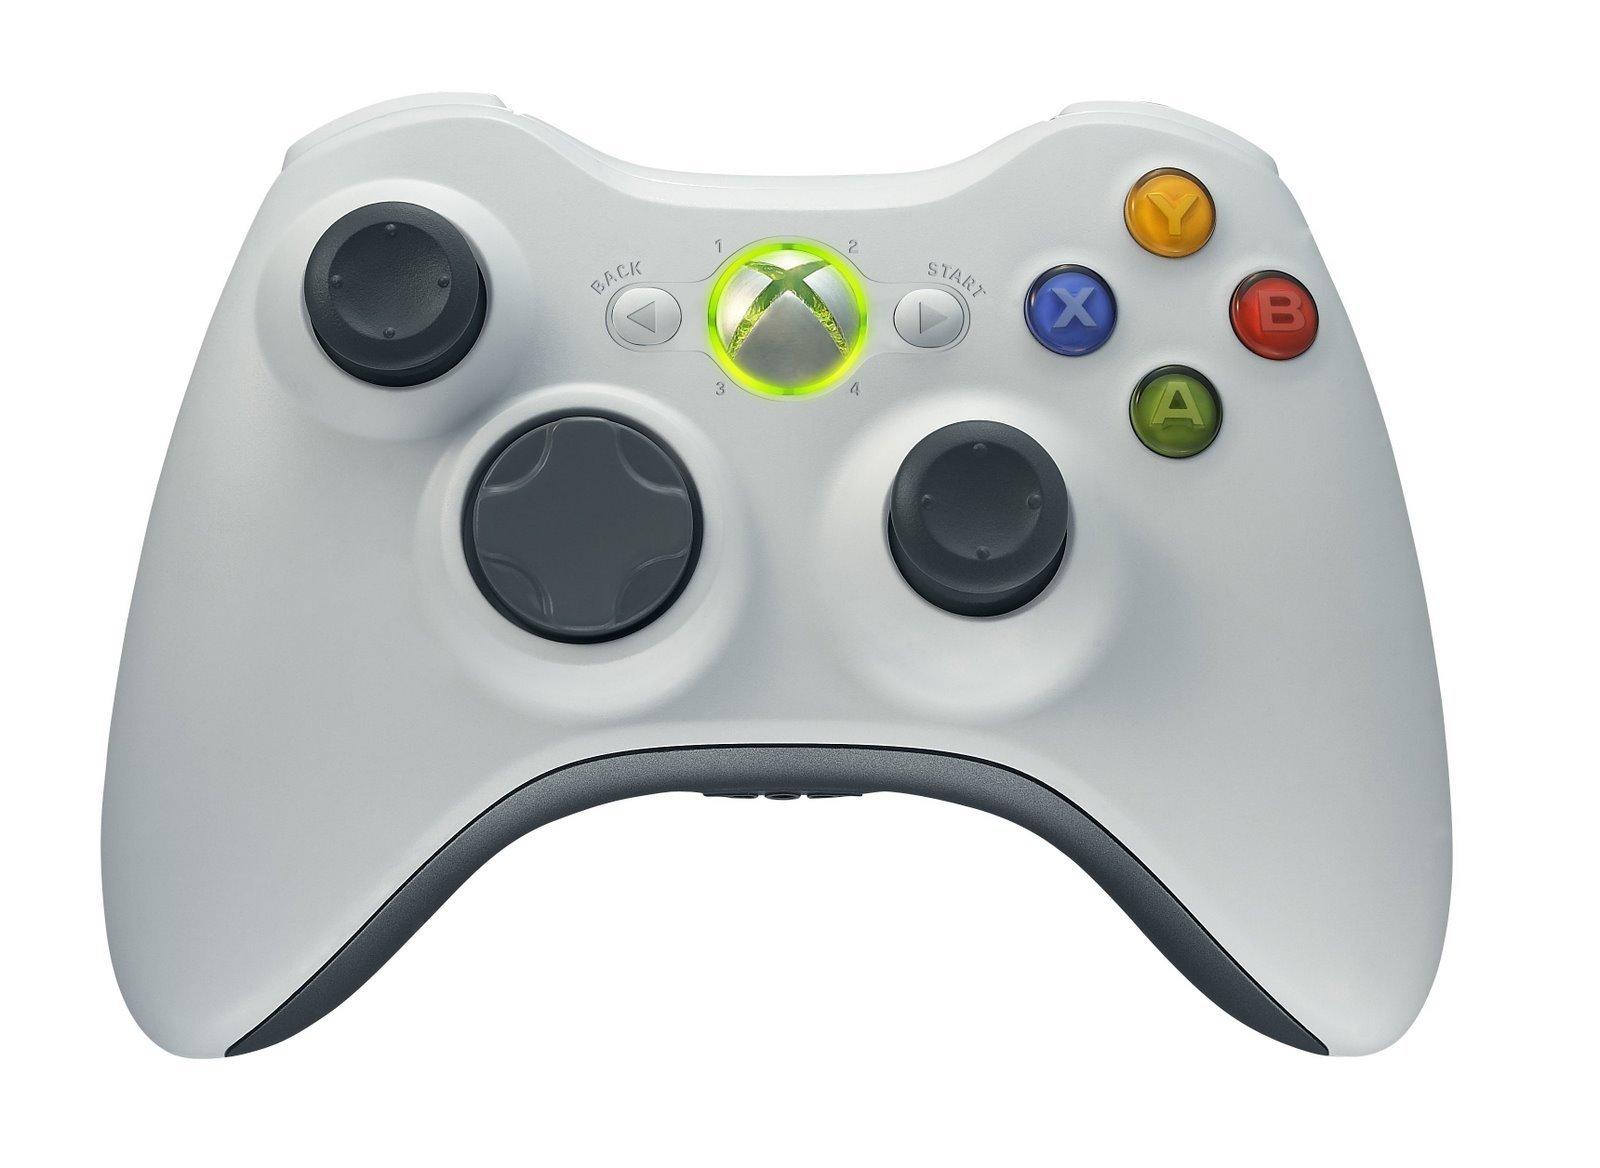 Xbox 360 Wireless Controller - White (Renewed)